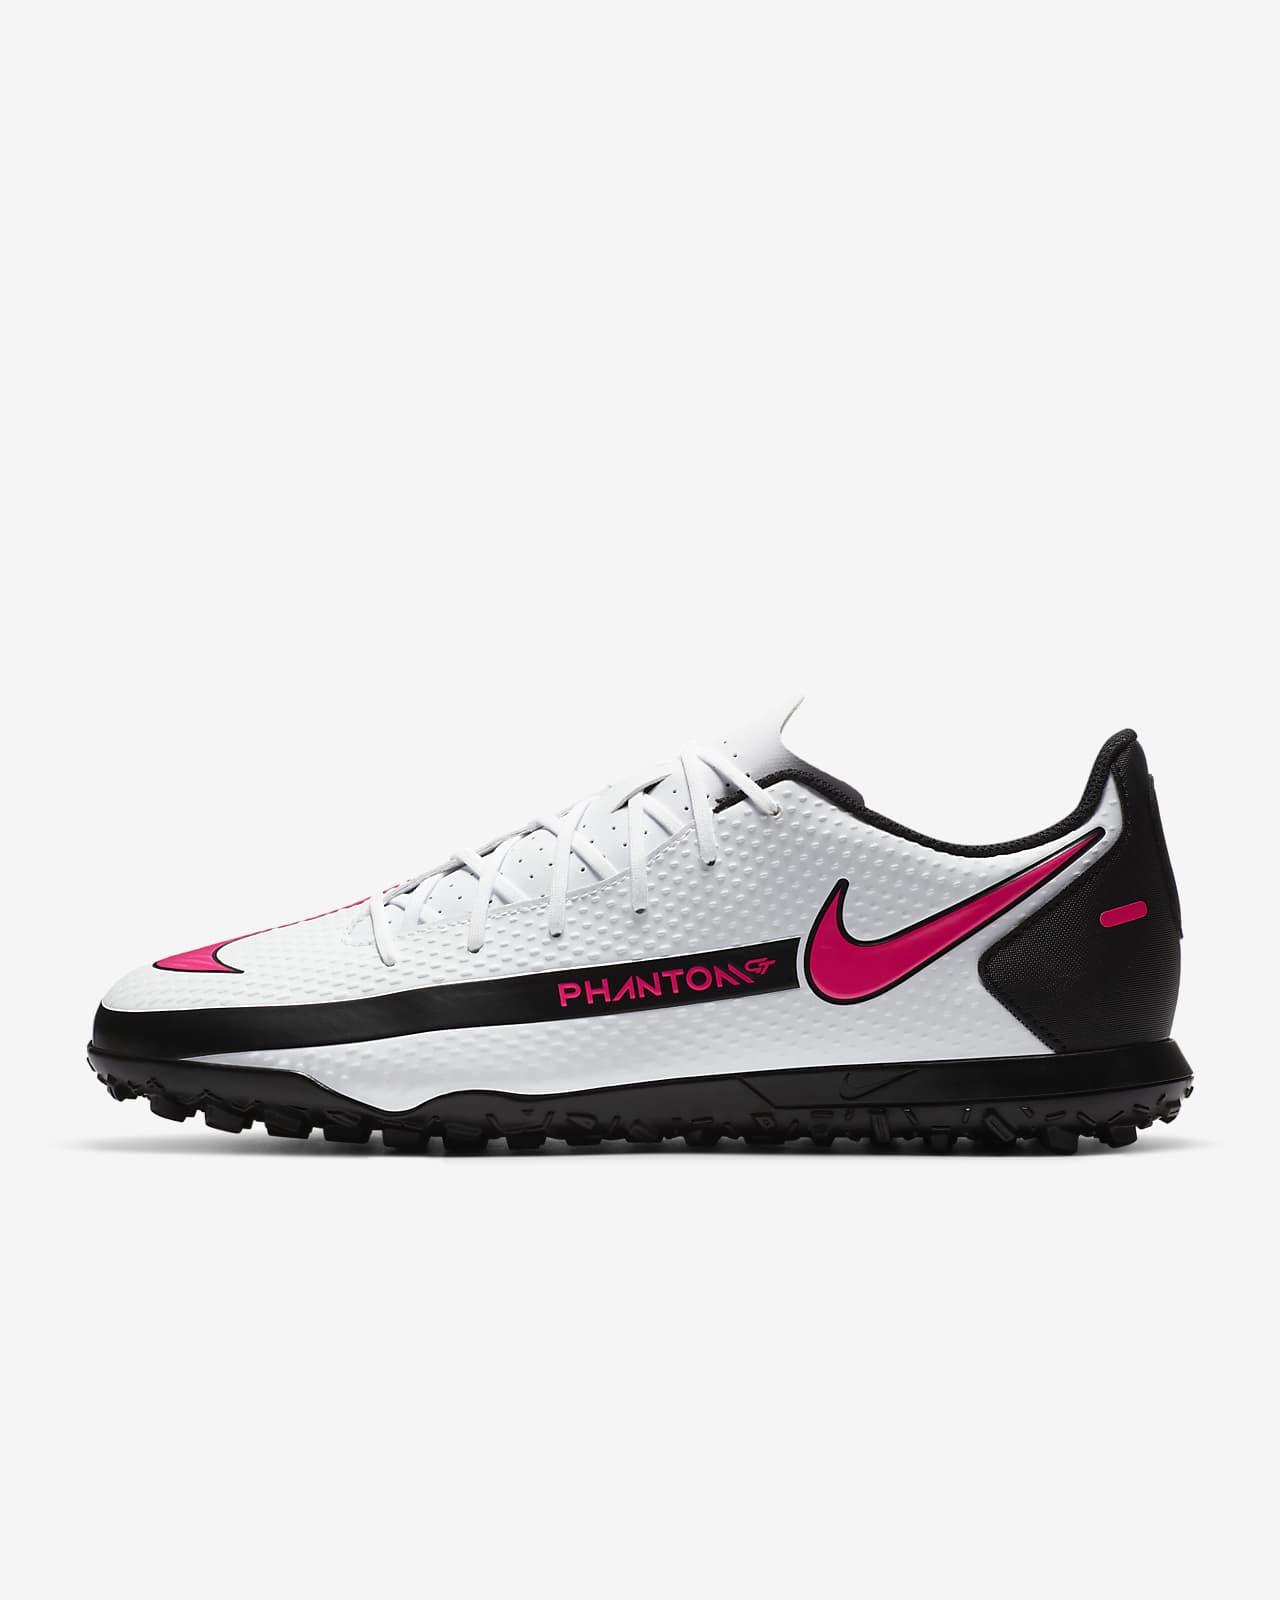 Chaussure de football pour surface synthétique Nike Phantom GT Club TF